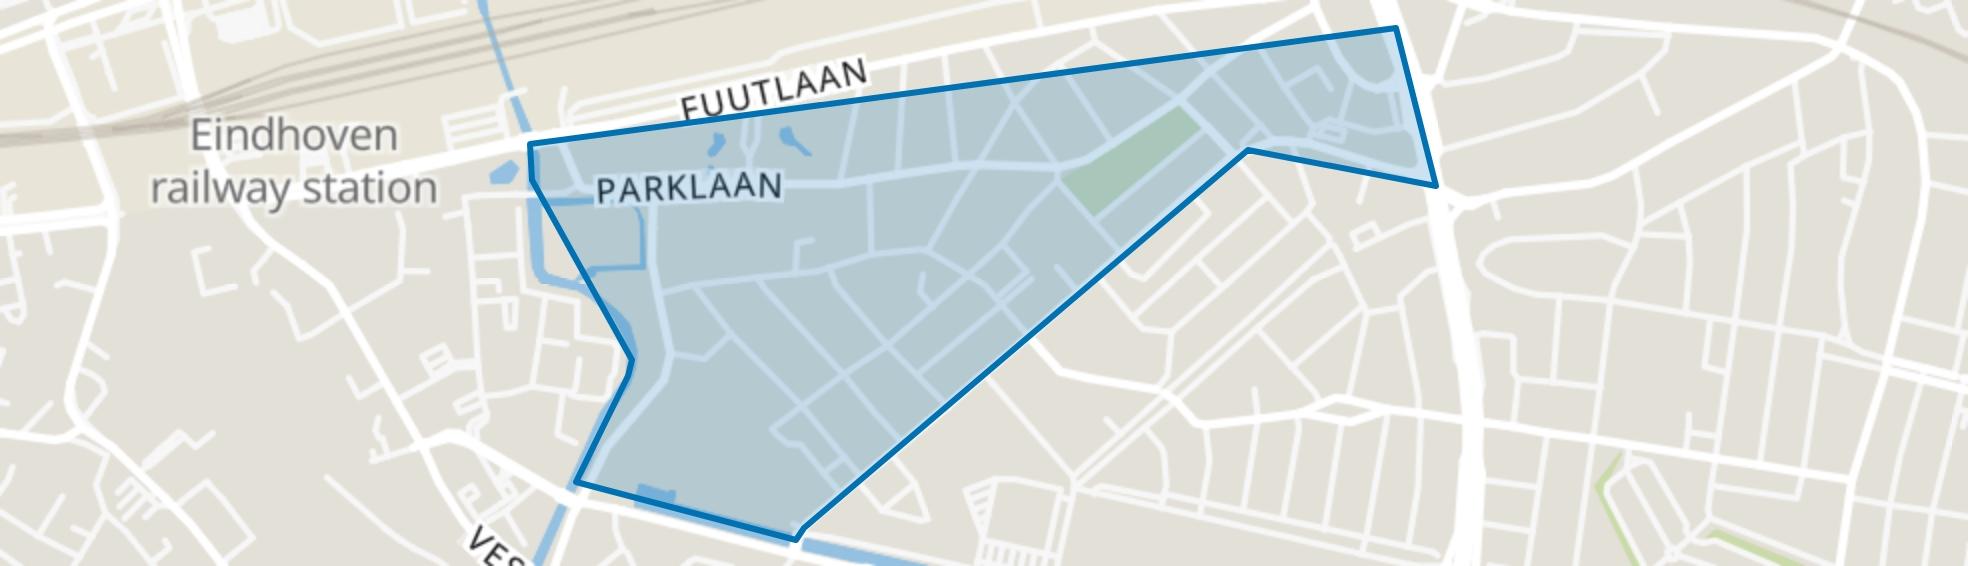 Villapark, Eindhoven map